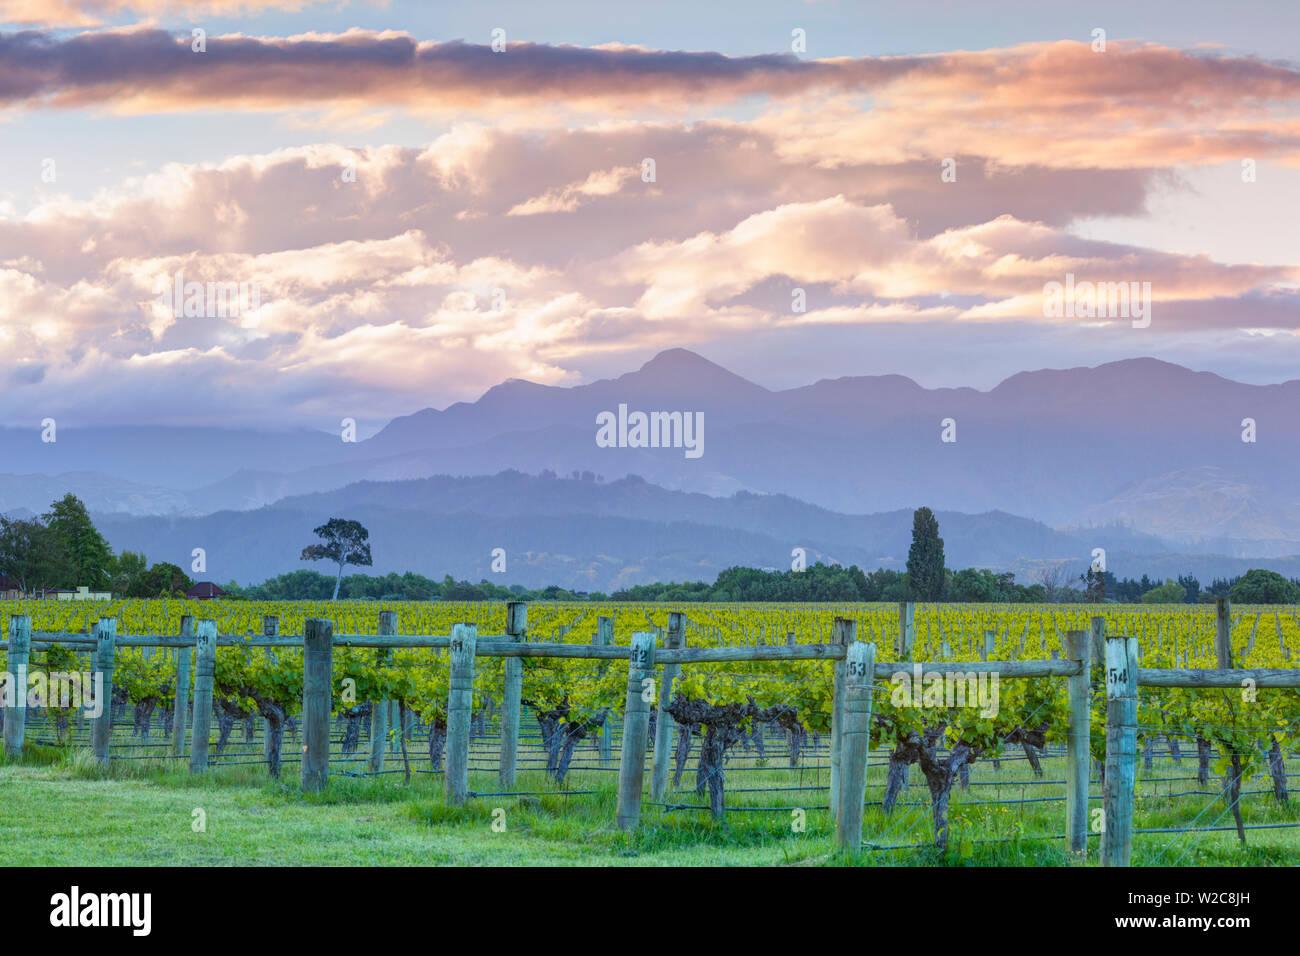 Picturesque Vineyard illuminated at sunset, Blenheim, Marlborough, South Island, New Zealand Stock Photo